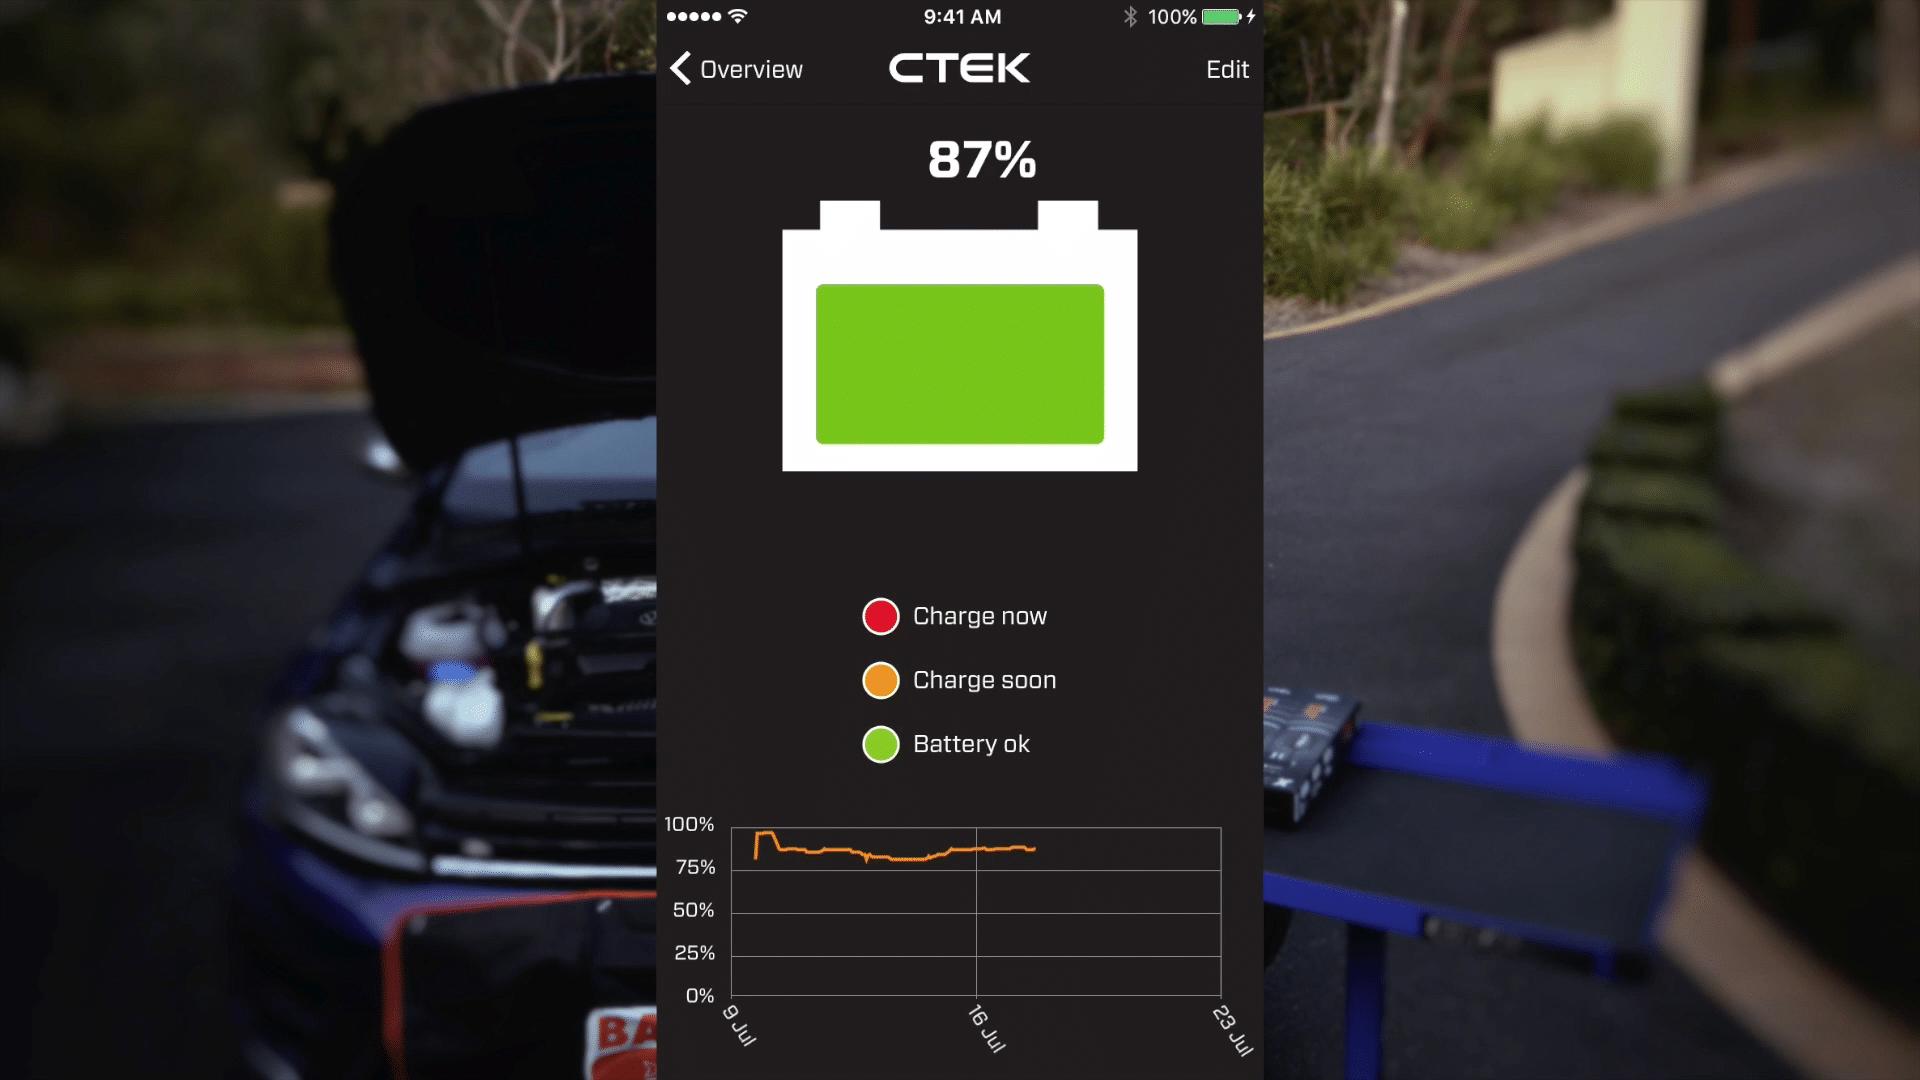 CTEK CTX Battery Sense Review